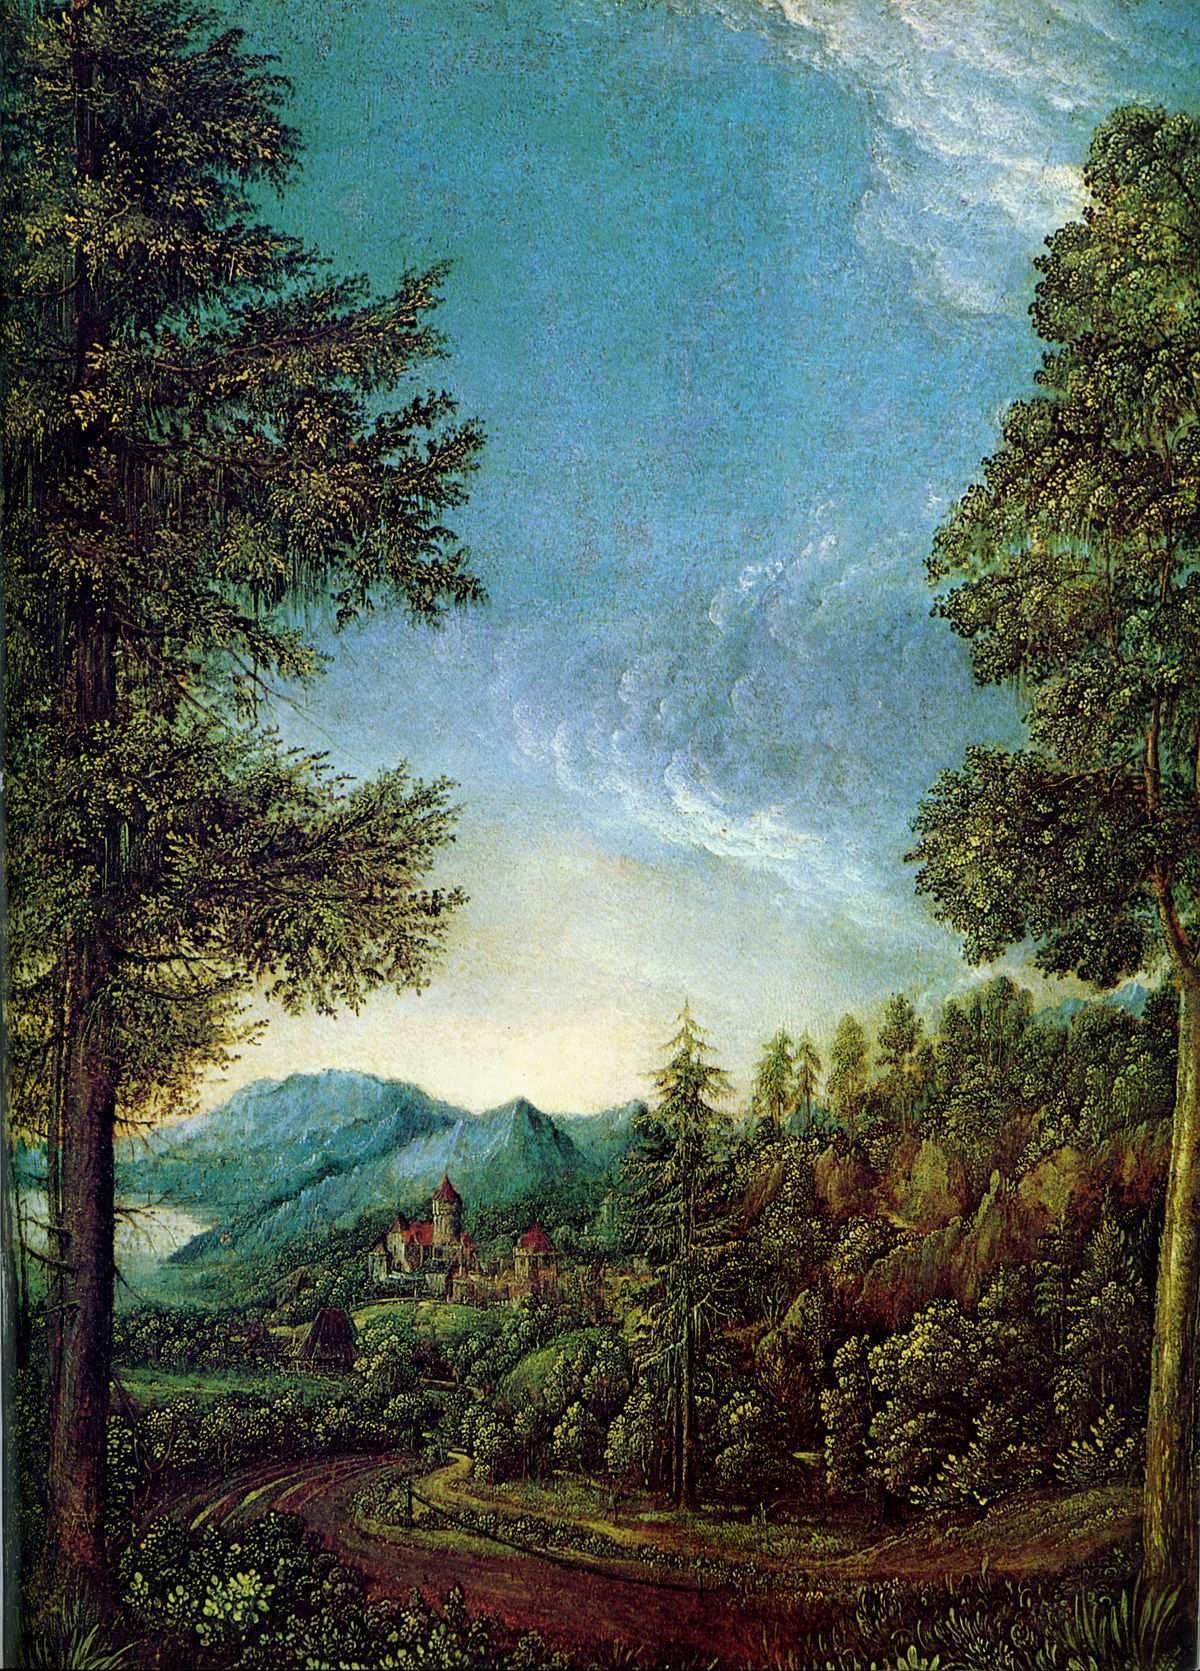 Landschaftsmalerei Wikipedia